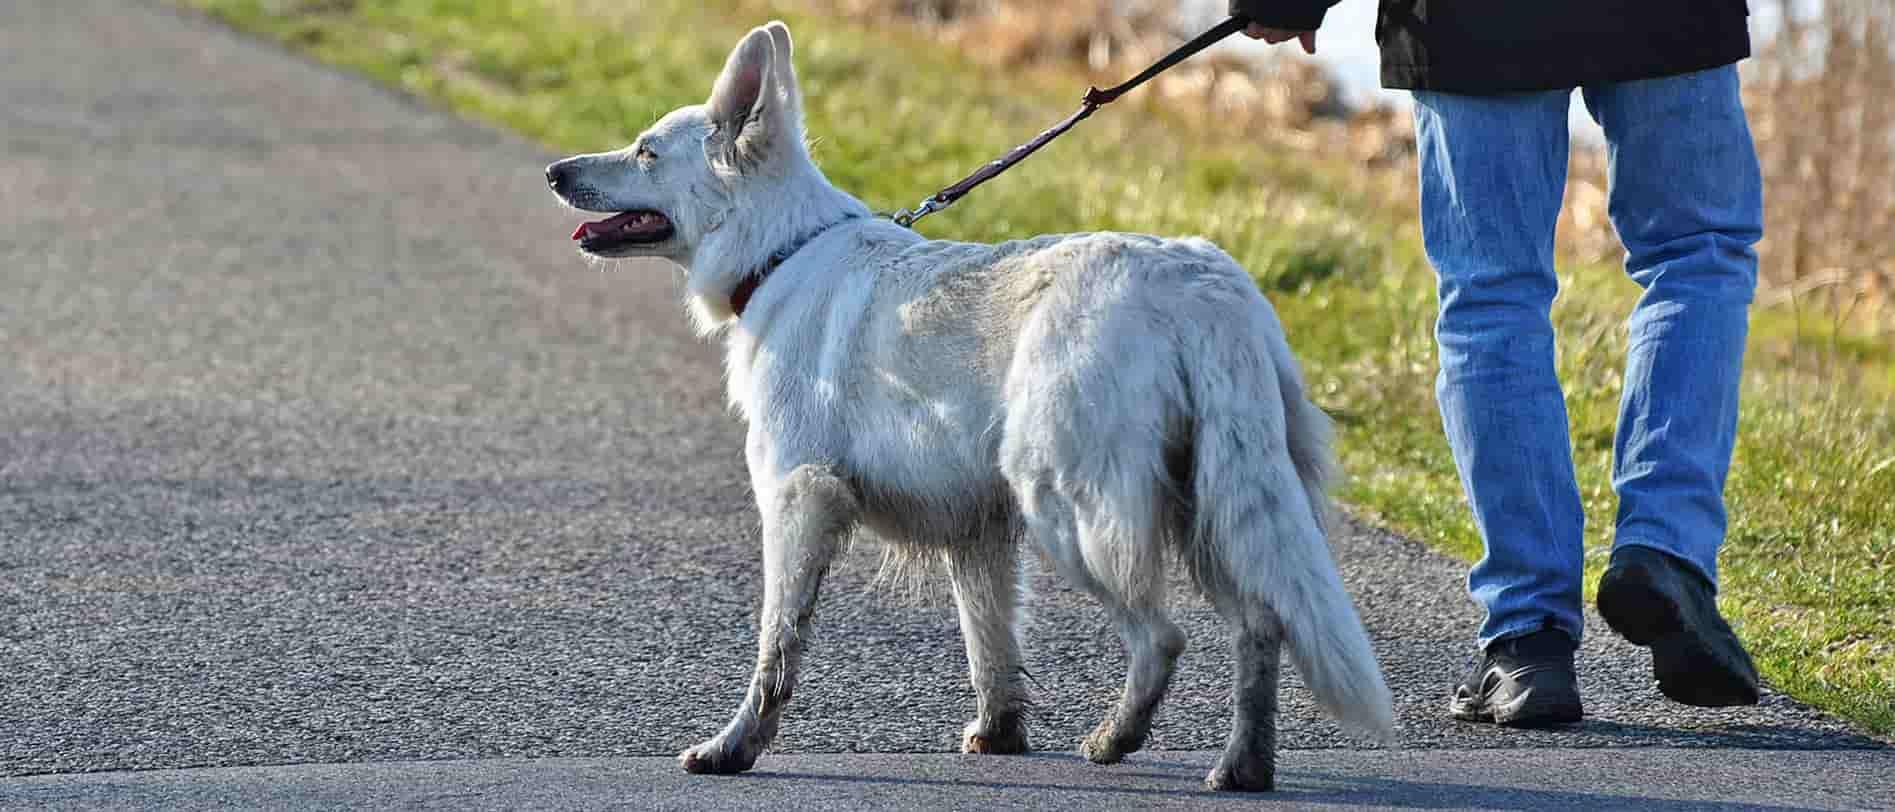 How can I help my dog with arthritis?